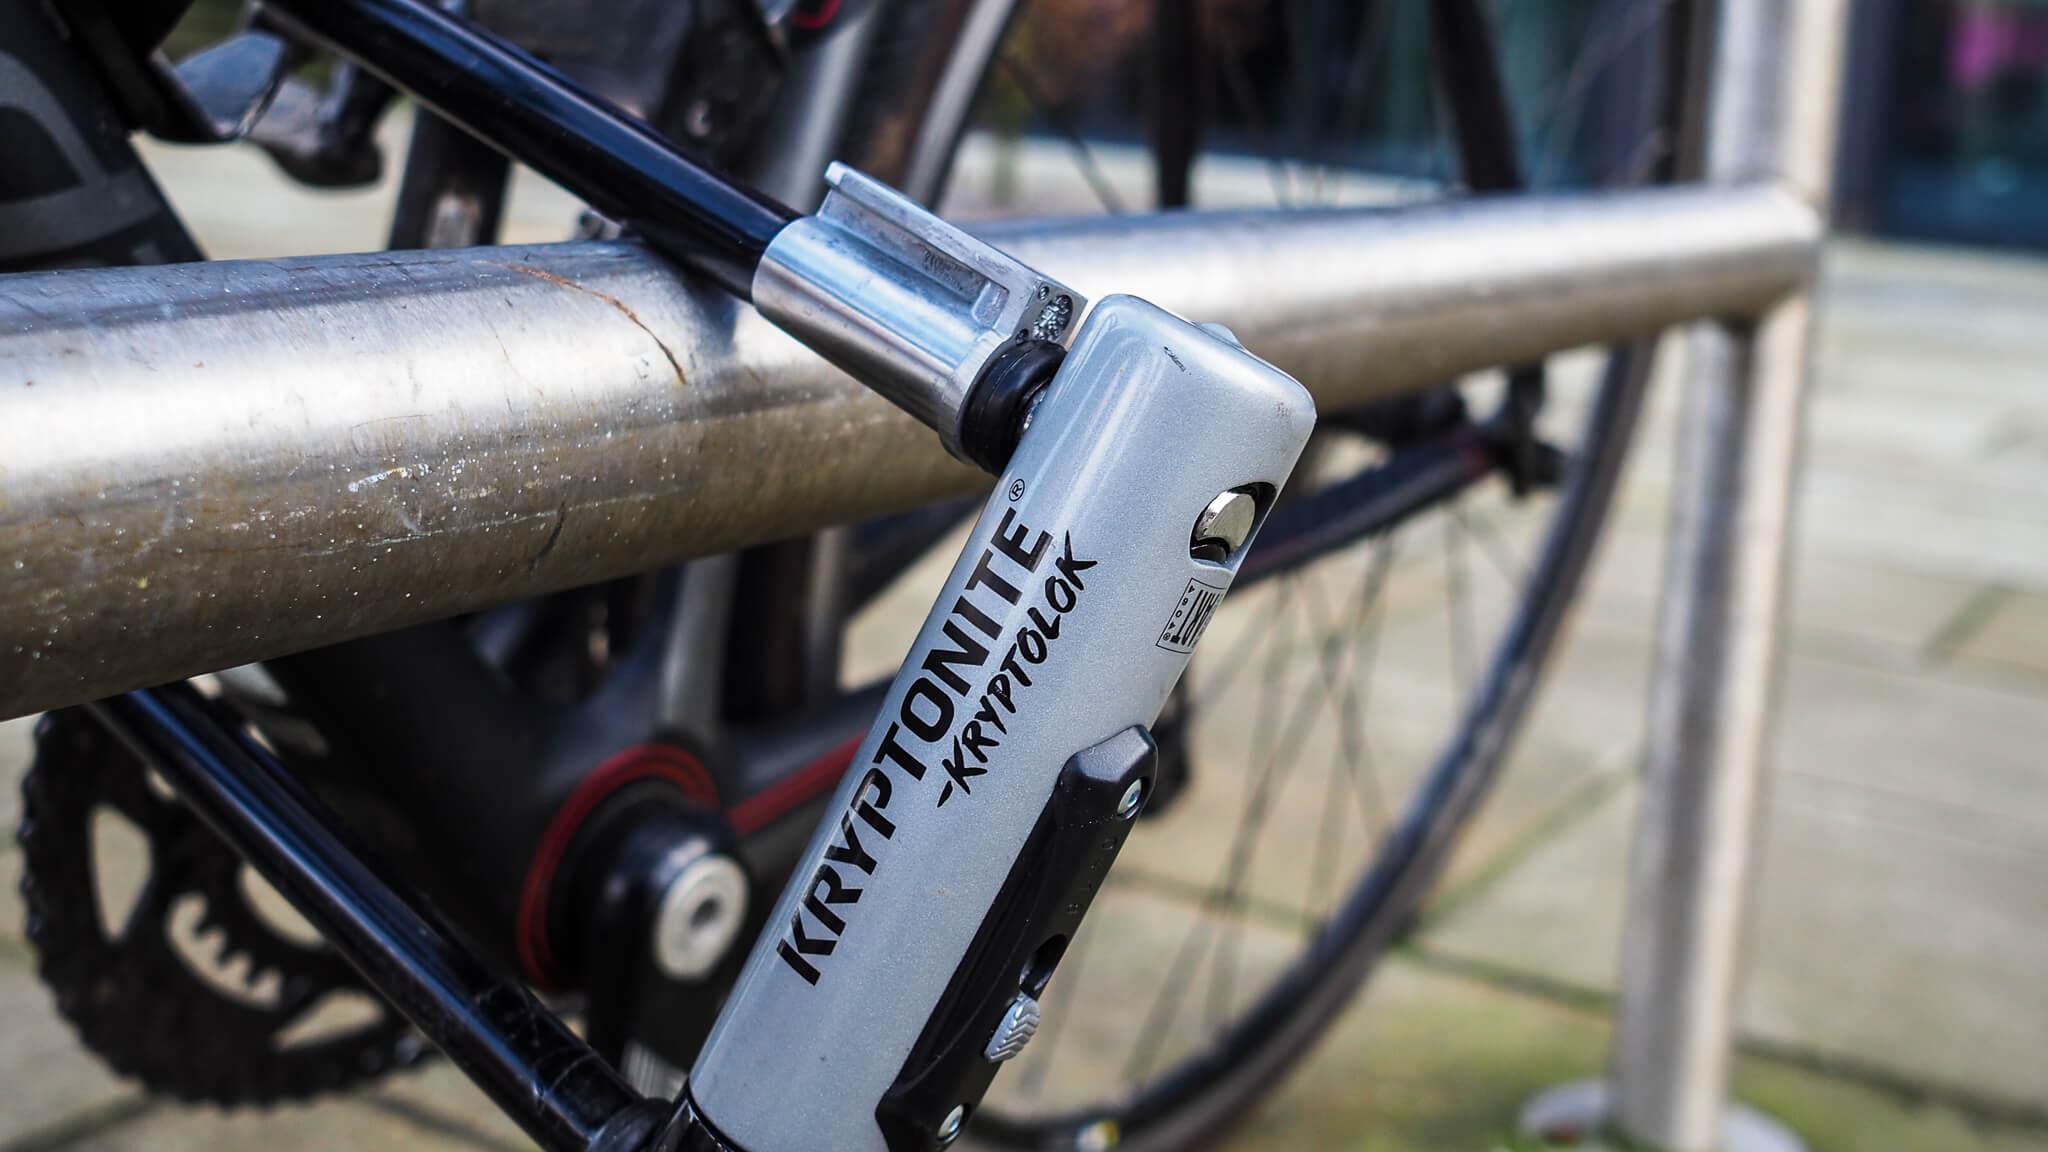 kryptonite sold secure rated cycle lock